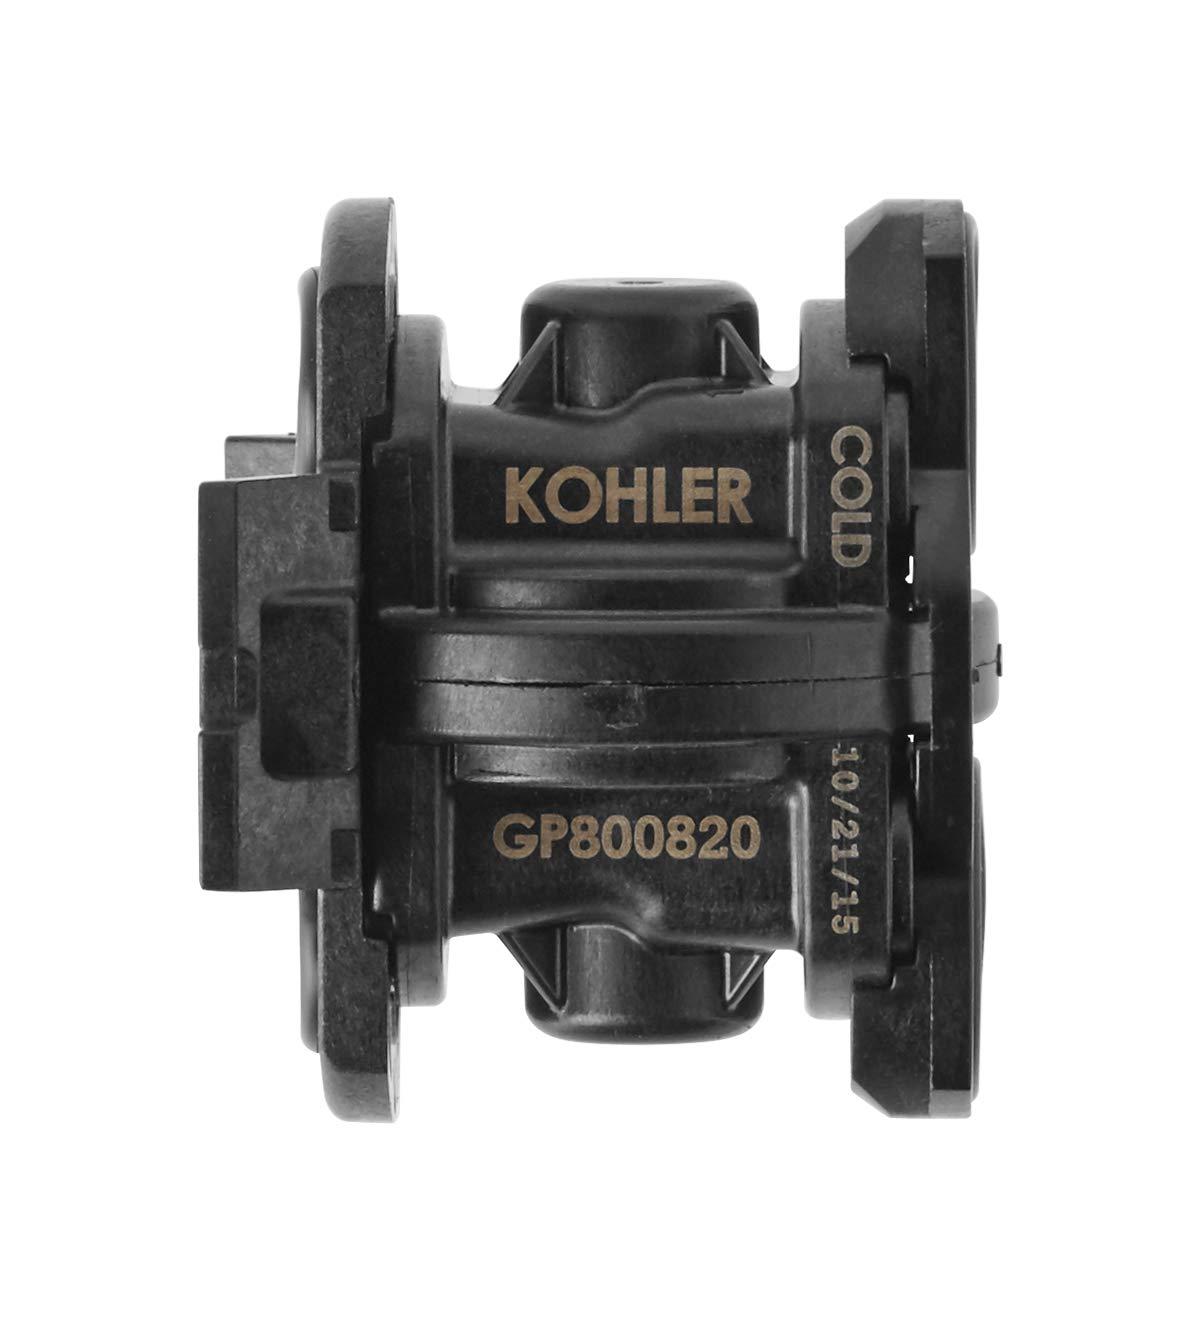 Kohler Part GP800820 Rite-Temp Pressure-Balancing Unit Cartridge, Black by Kohler (Image #3)